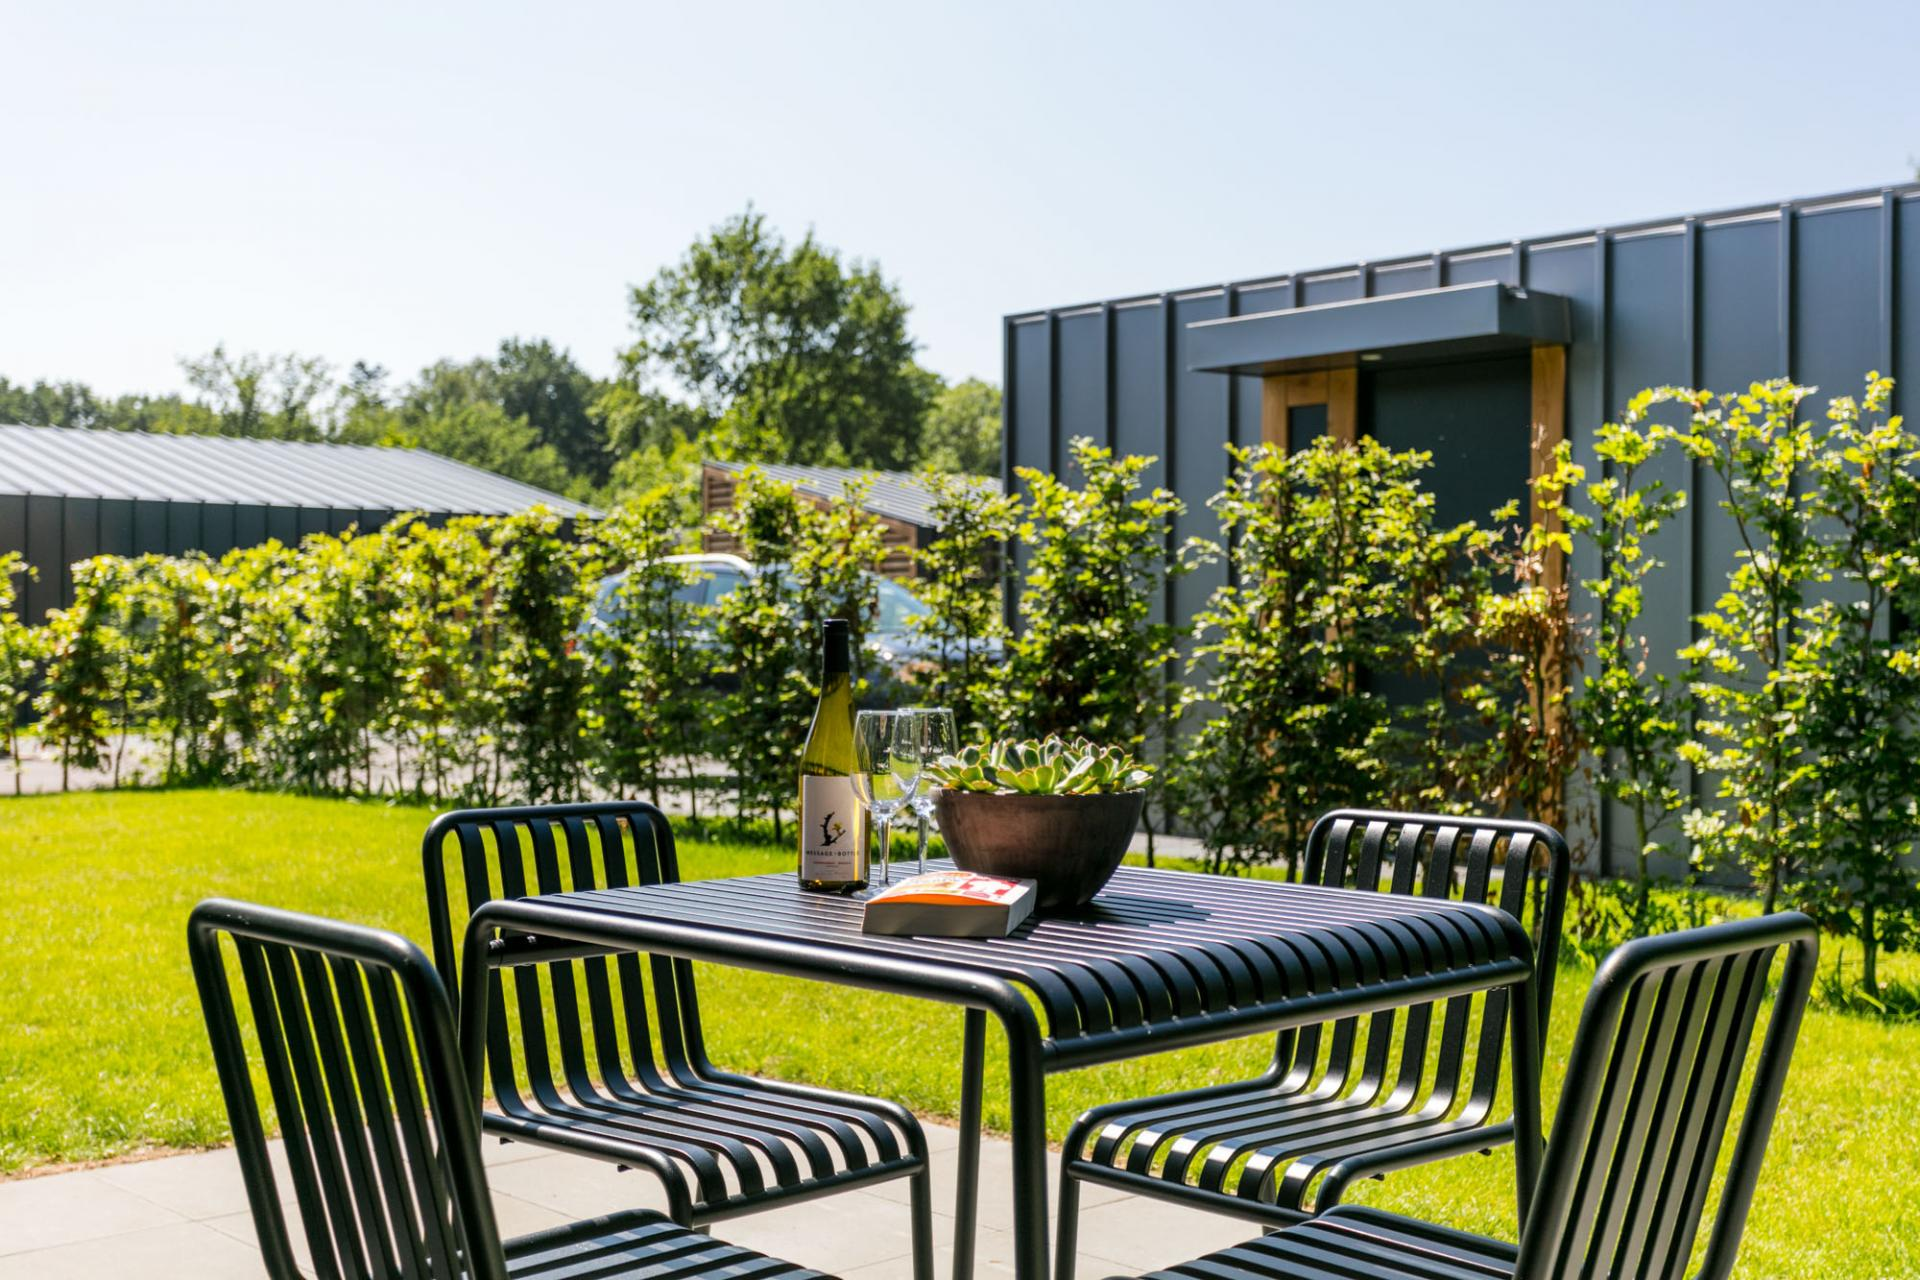 Terrace area at Gooilanden Lodges